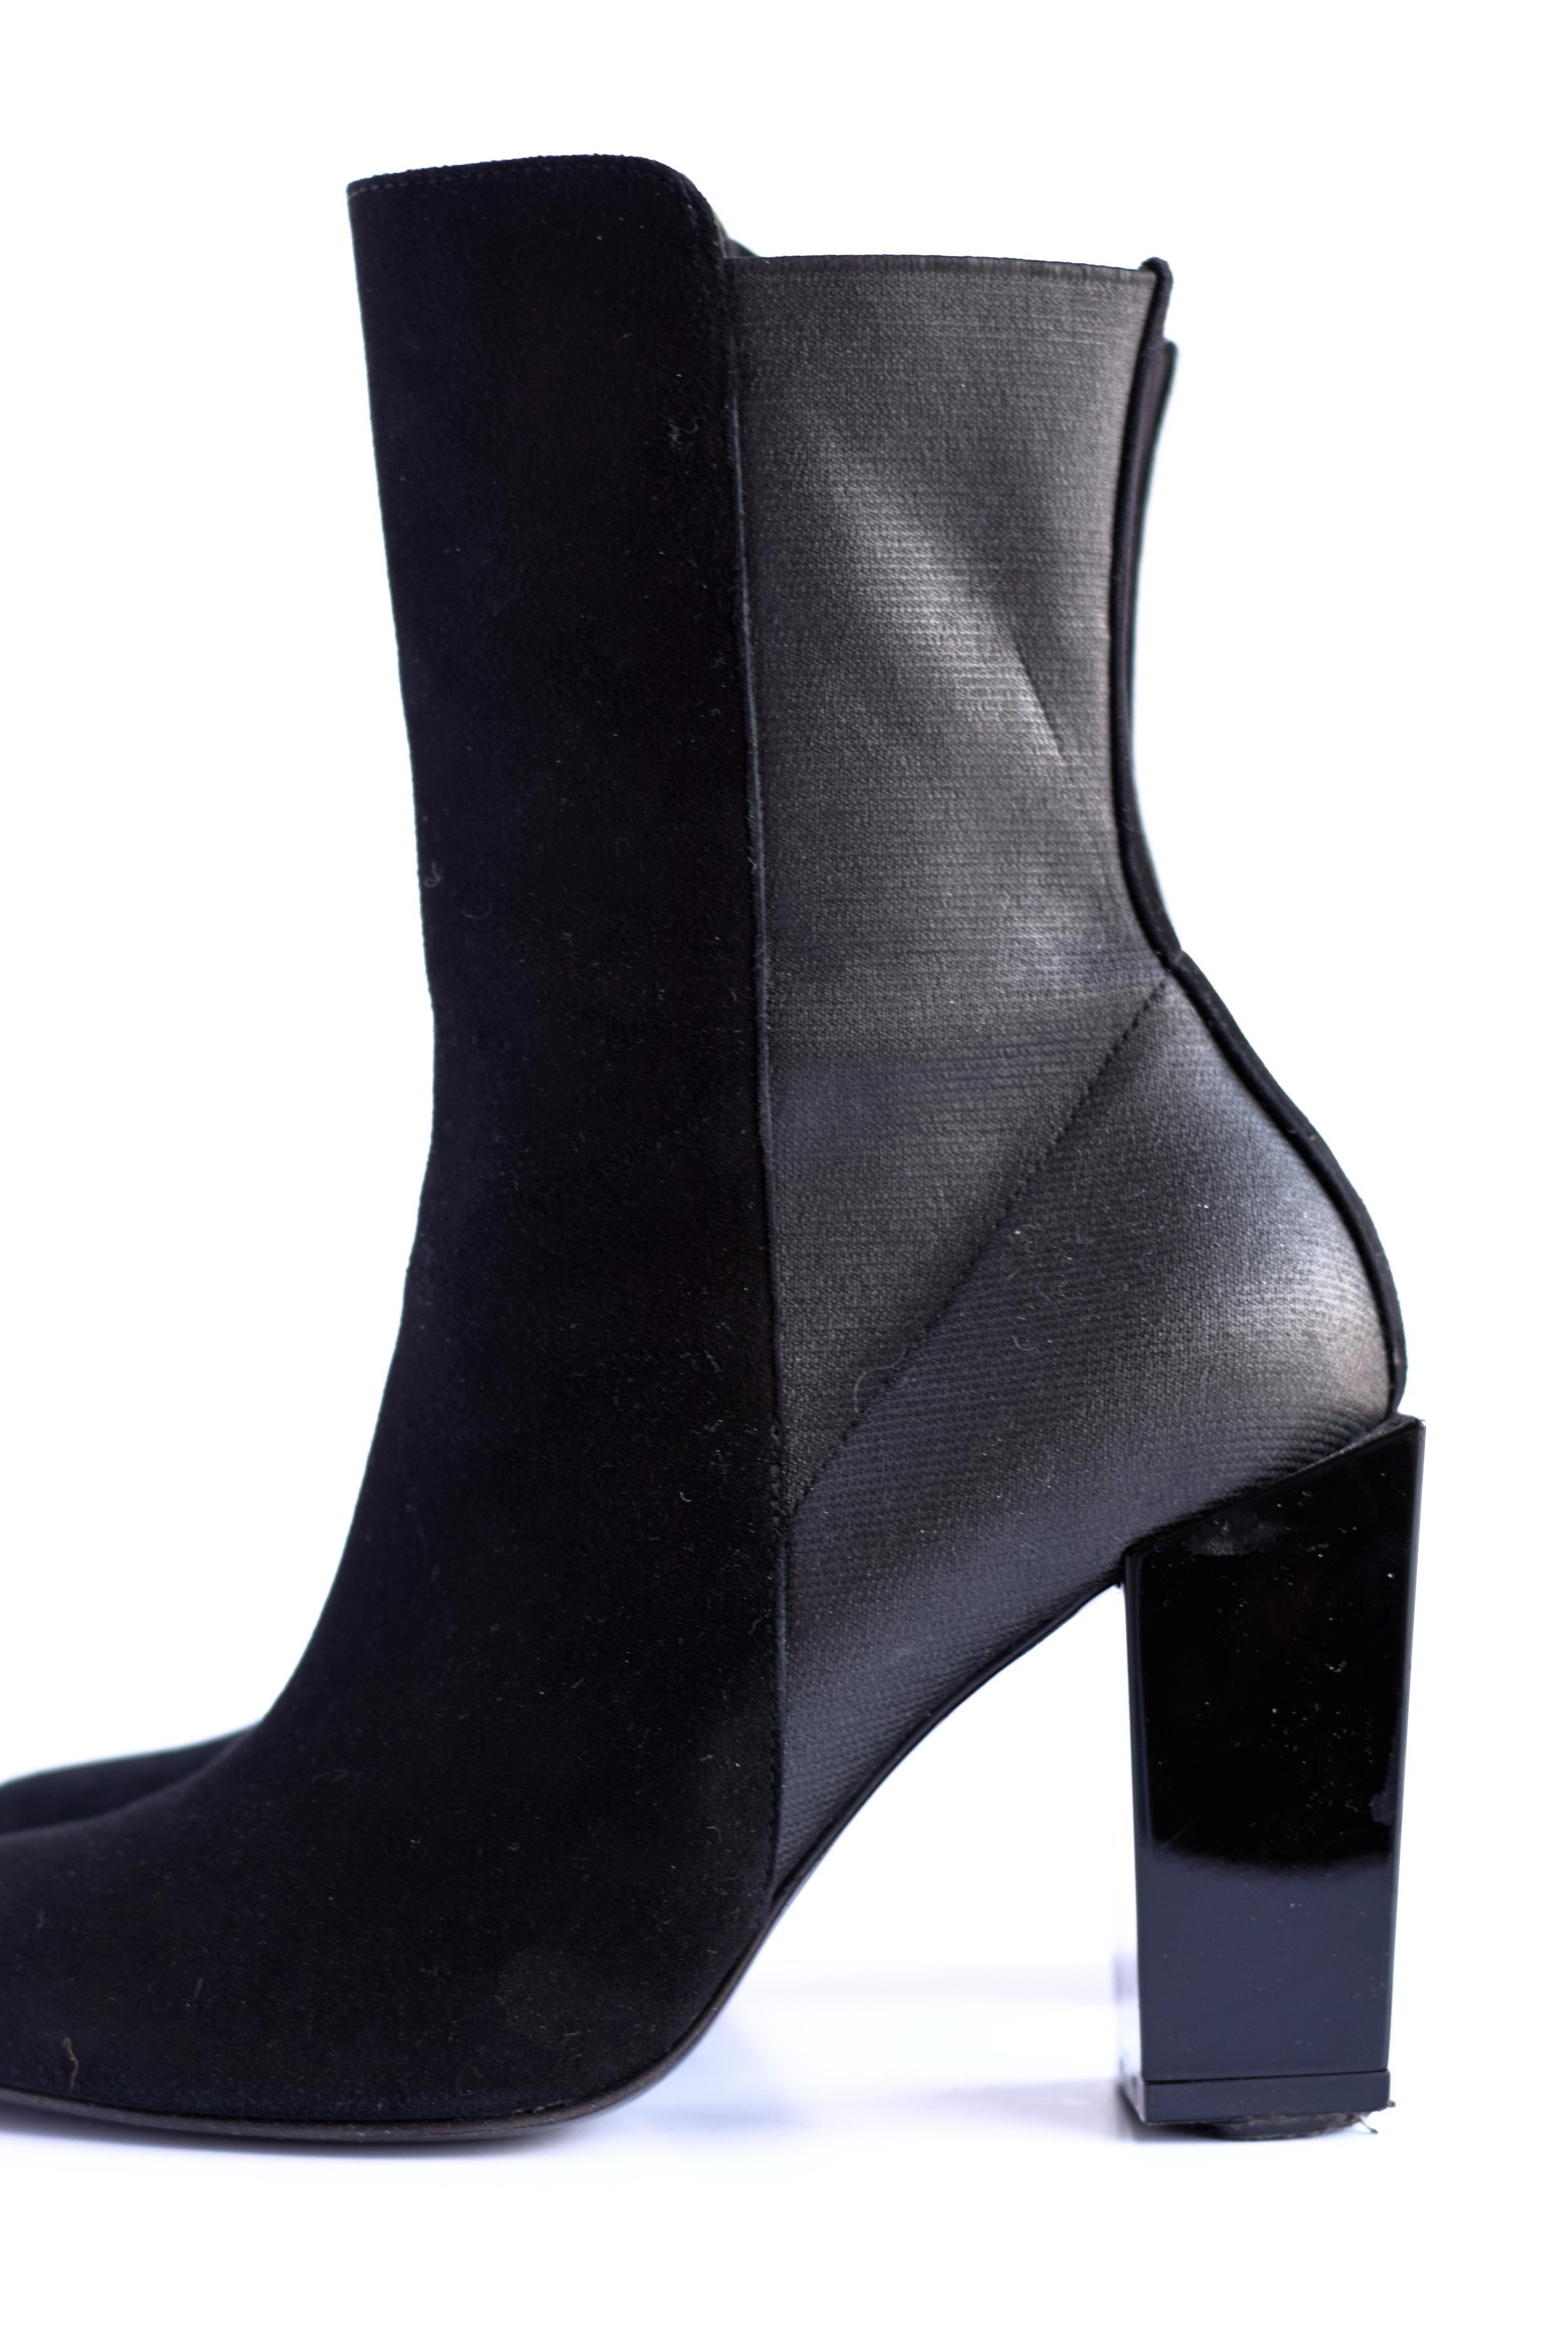 short black heeled boots